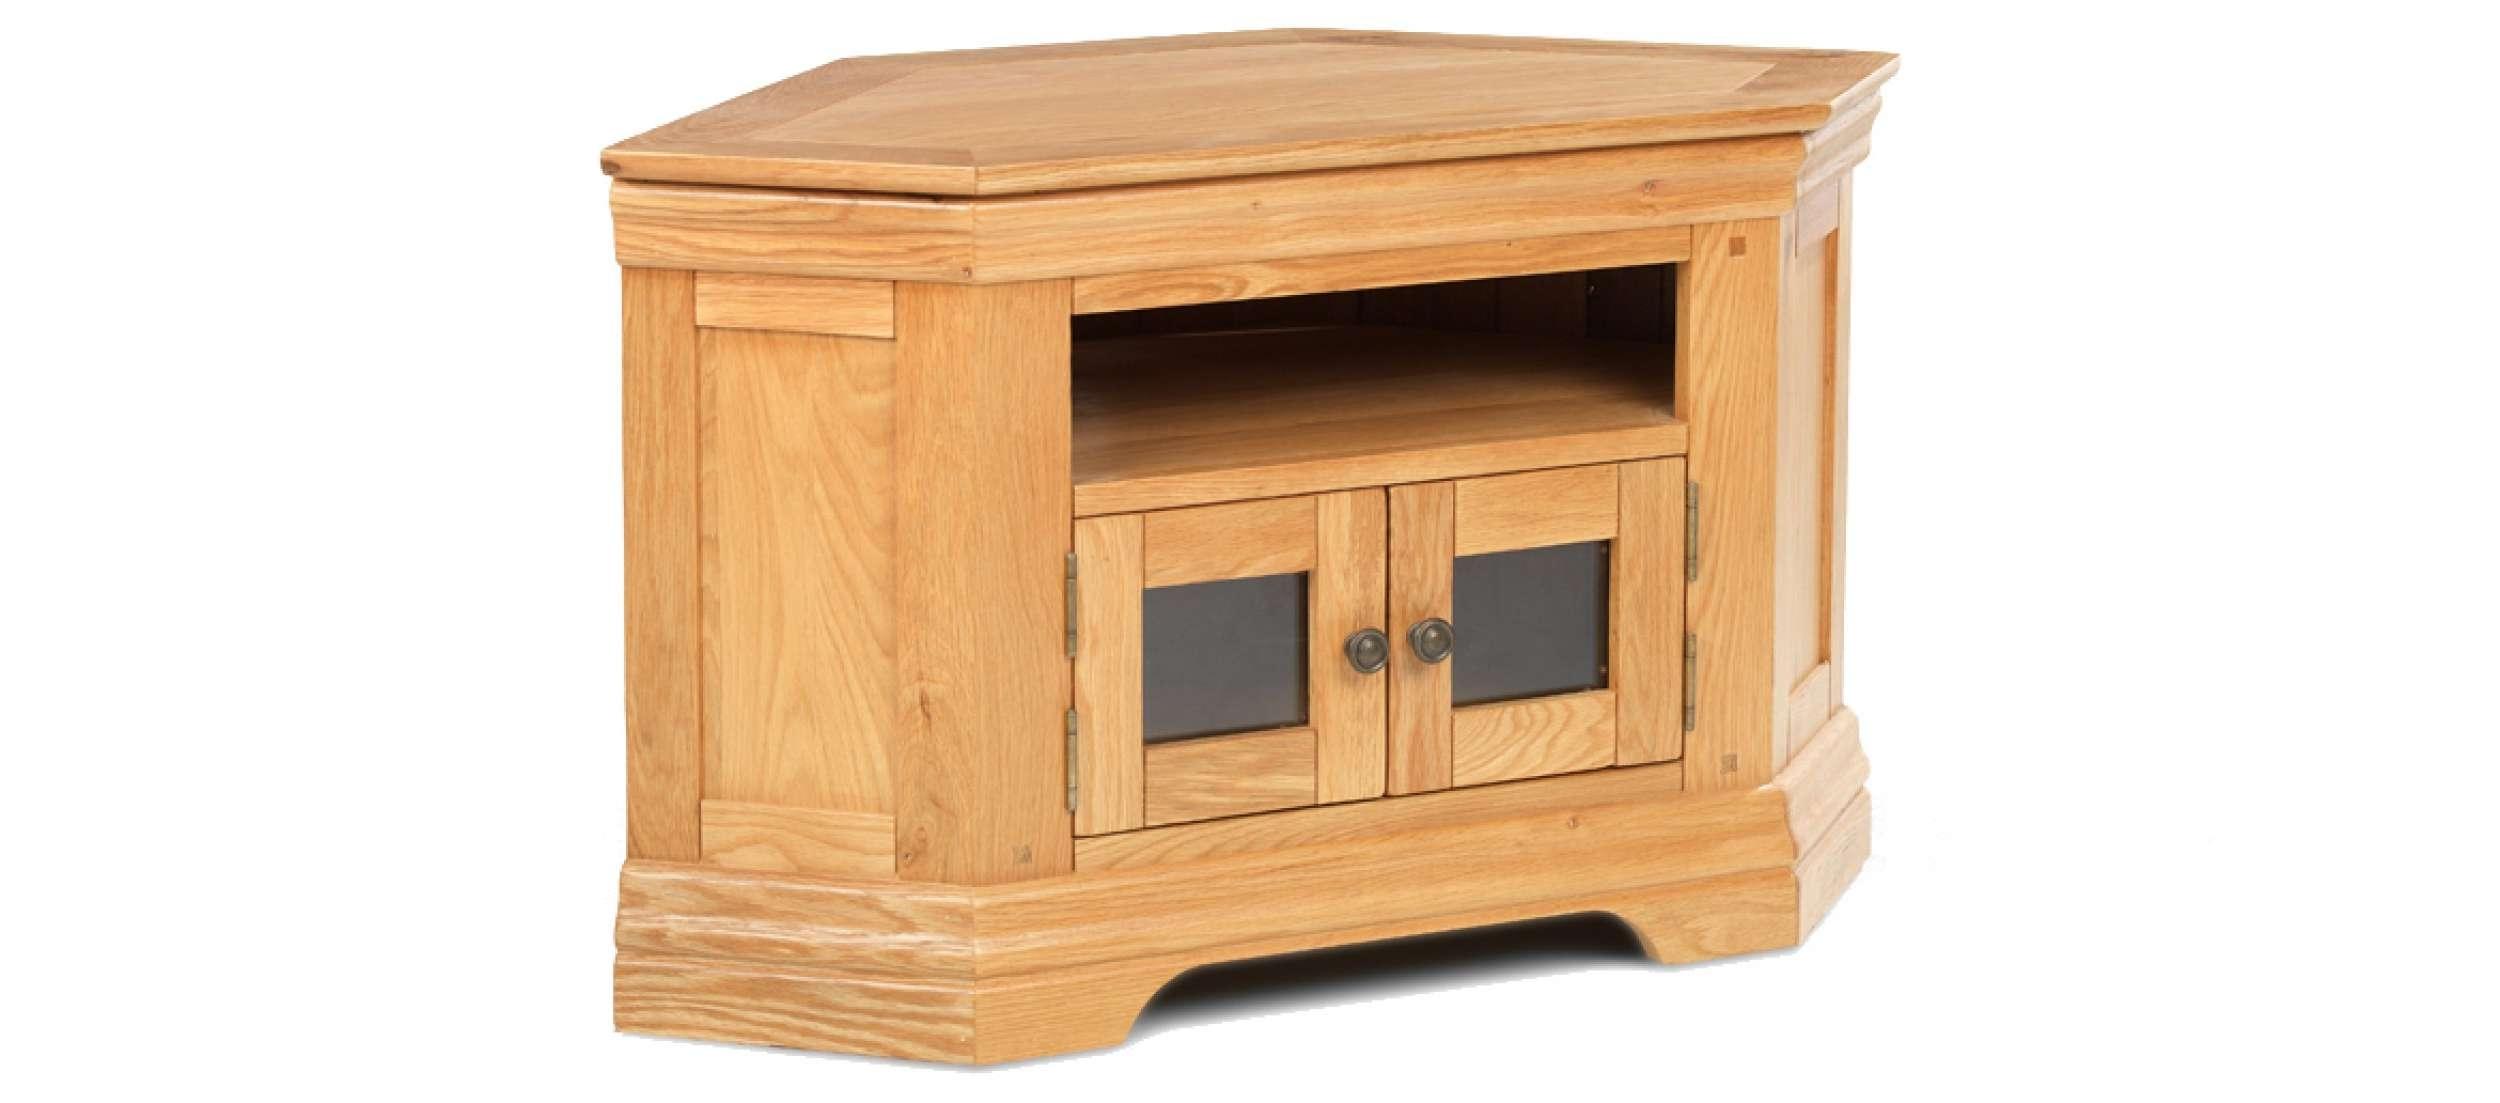 Constance Oak Corner Tv Cabinet | Quercus Living In Corner Wooden Tv Cabinets (View 6 of 20)